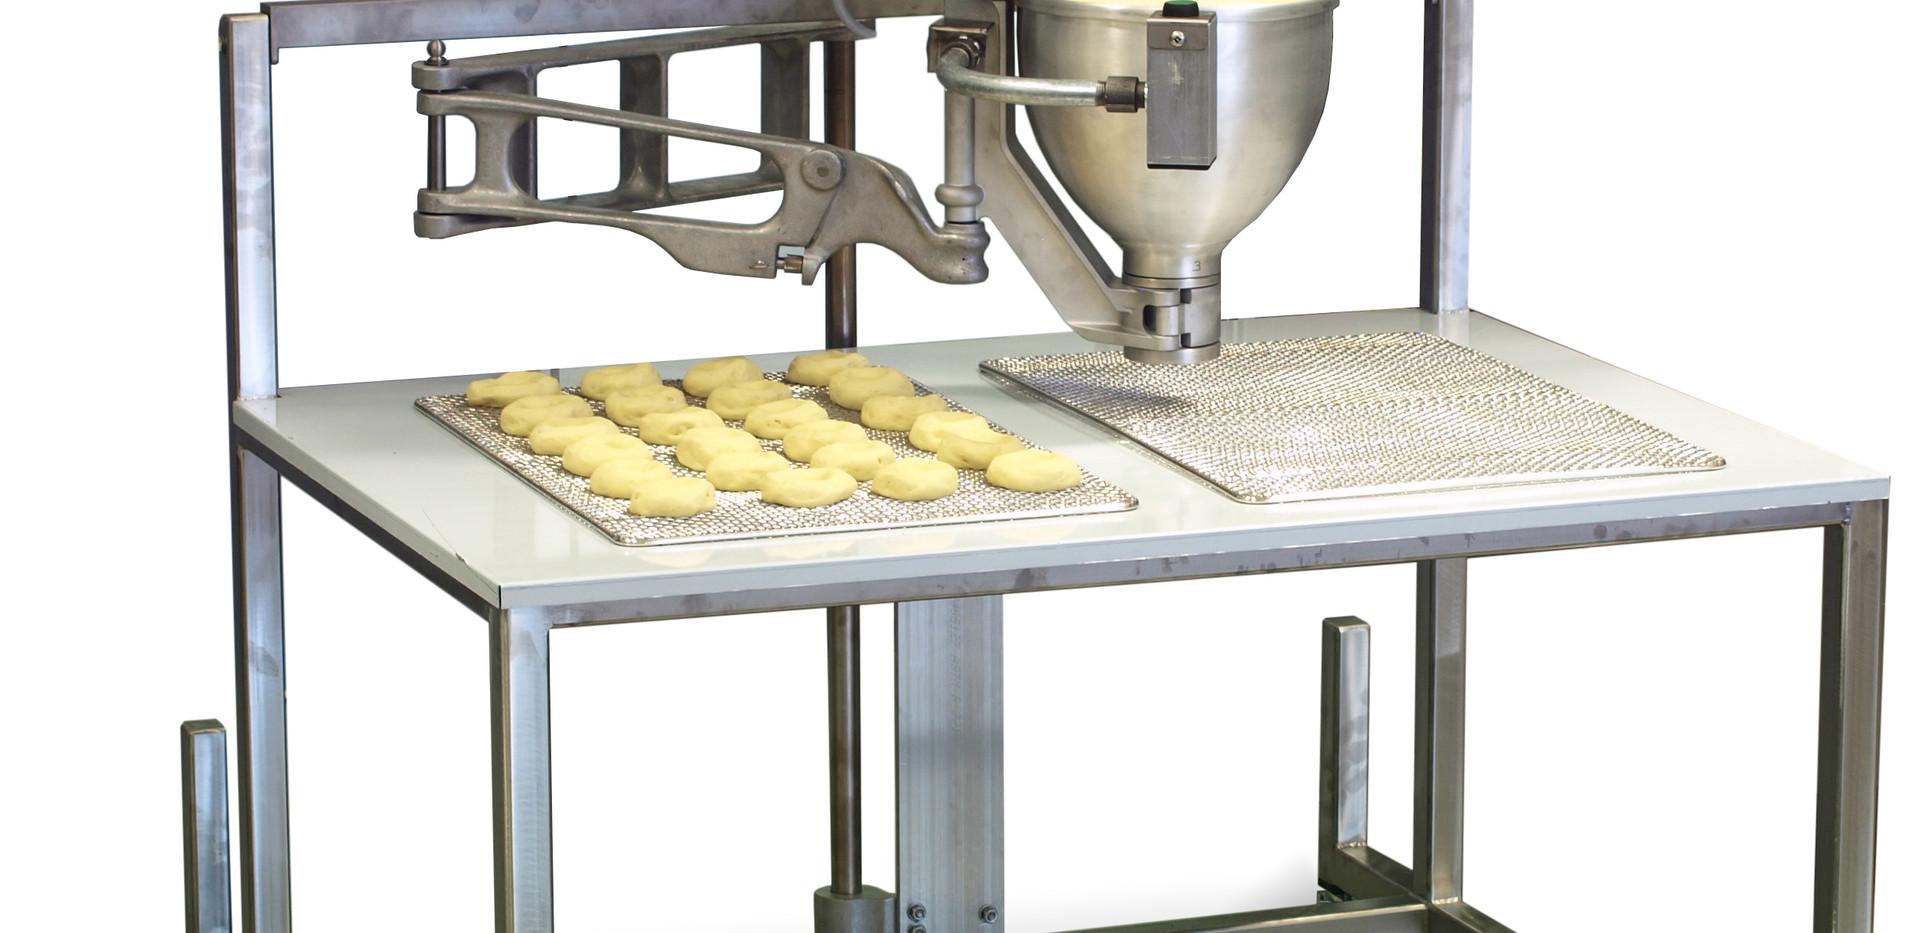 Belshaw F-YRD Raised Donut Depositor.jpg